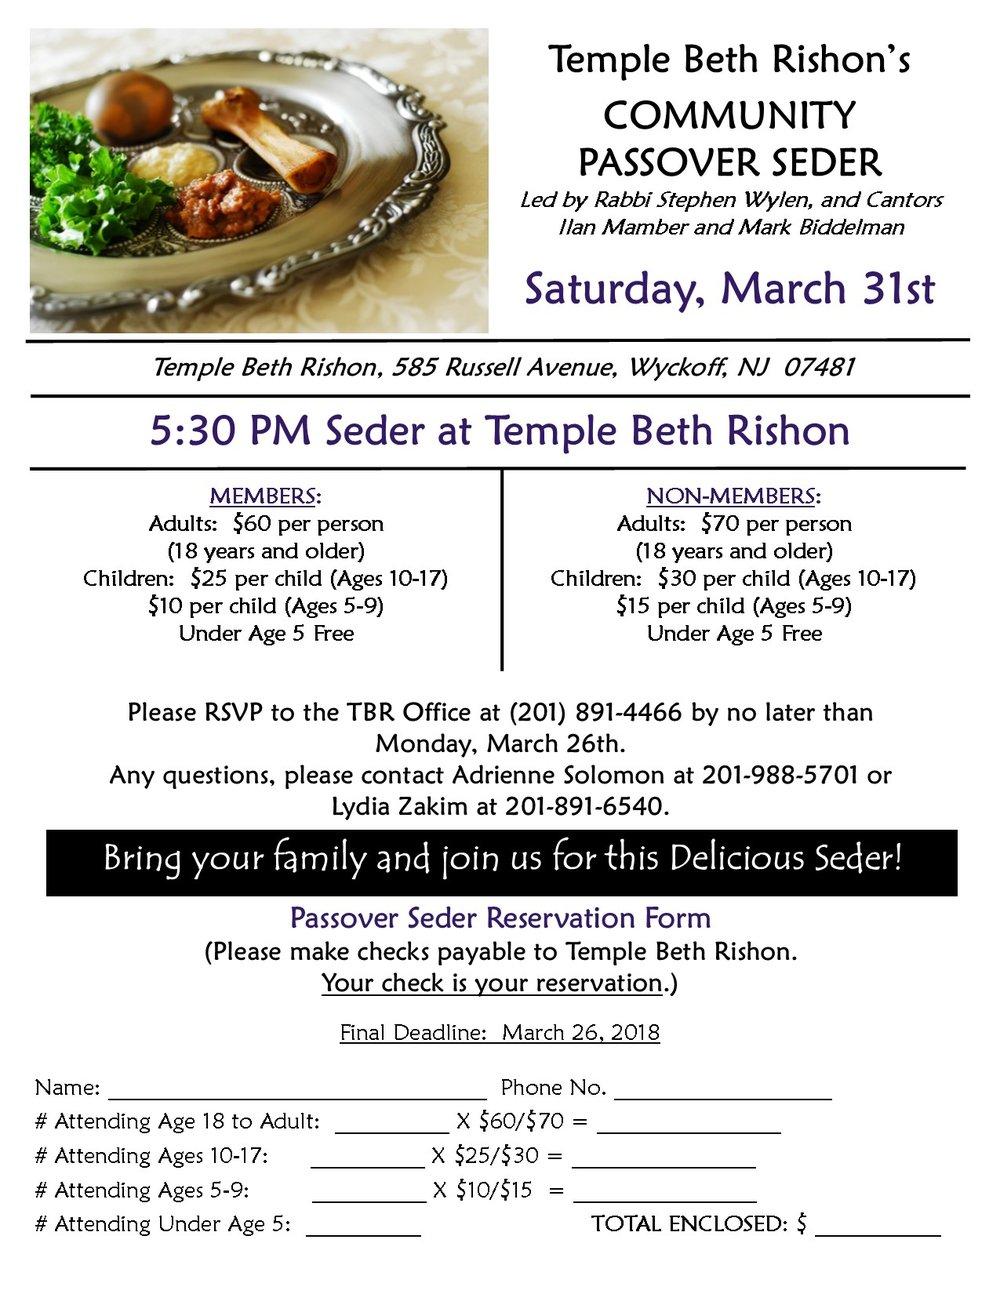 PassoverCongSederFlyer18 -COMMUNITY.jpg